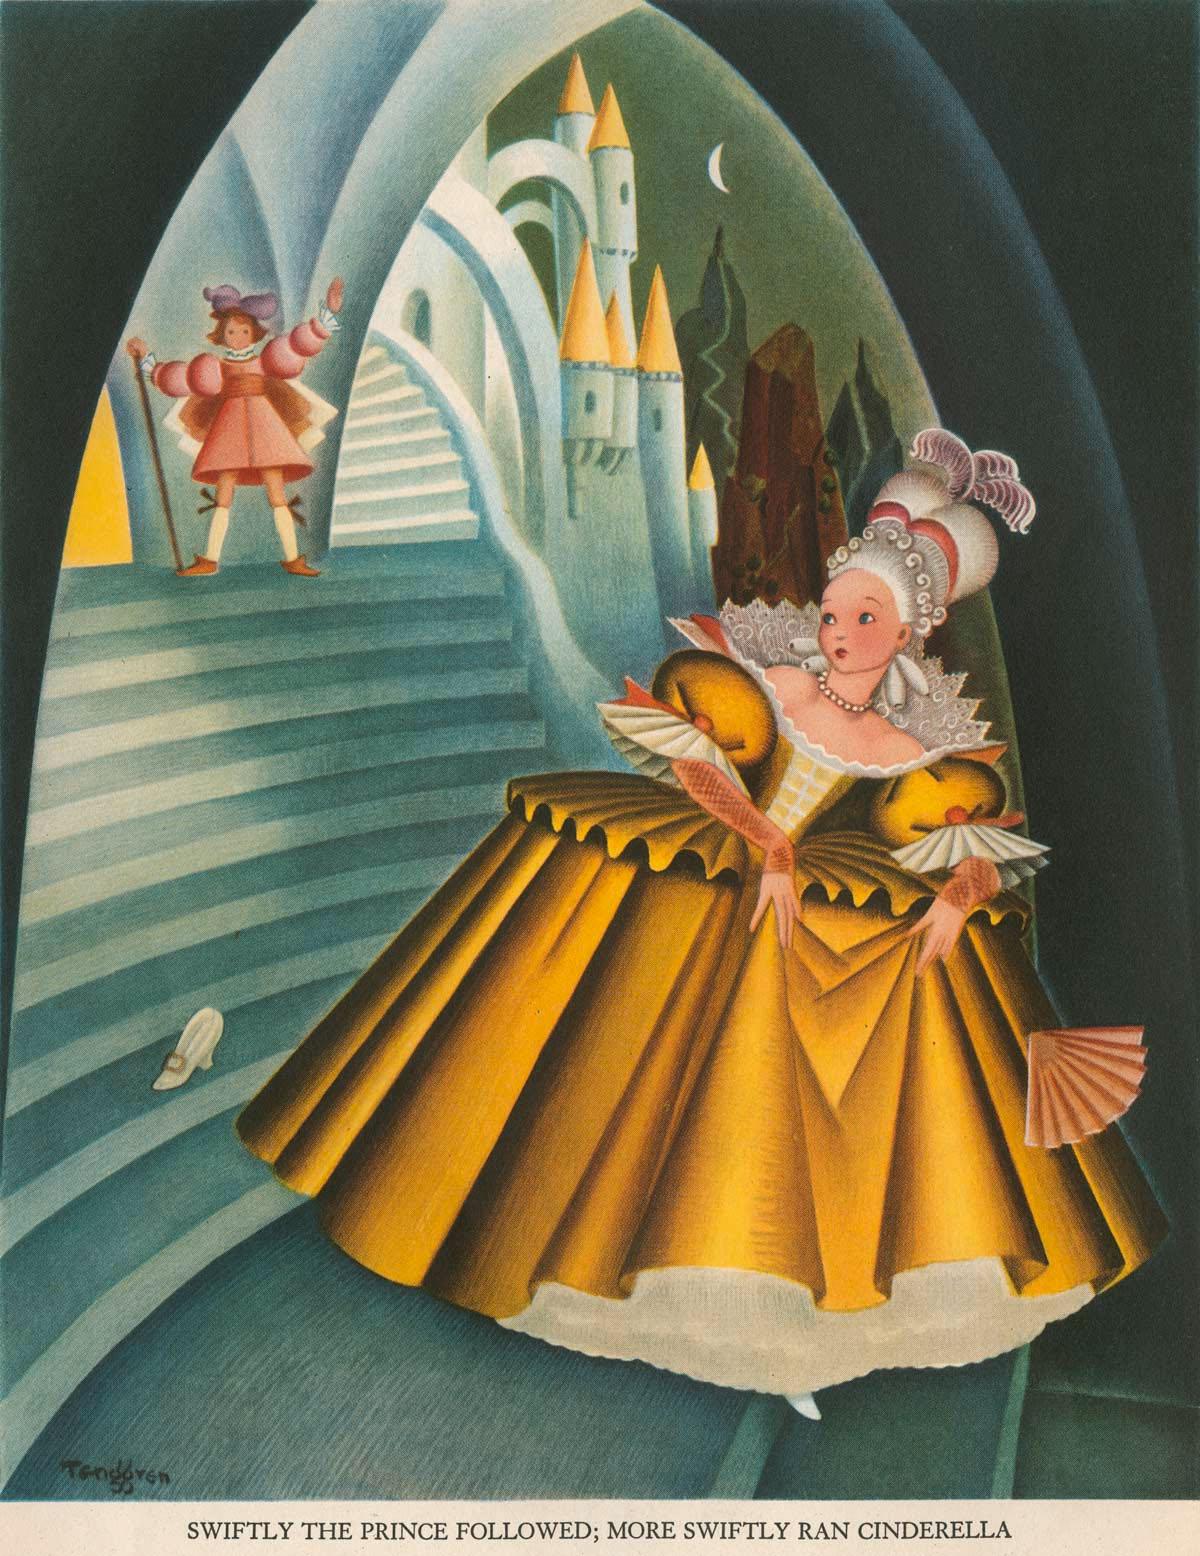 Gustaf Adolf Tenggren - The Tenggren tell it again book - Cinderella